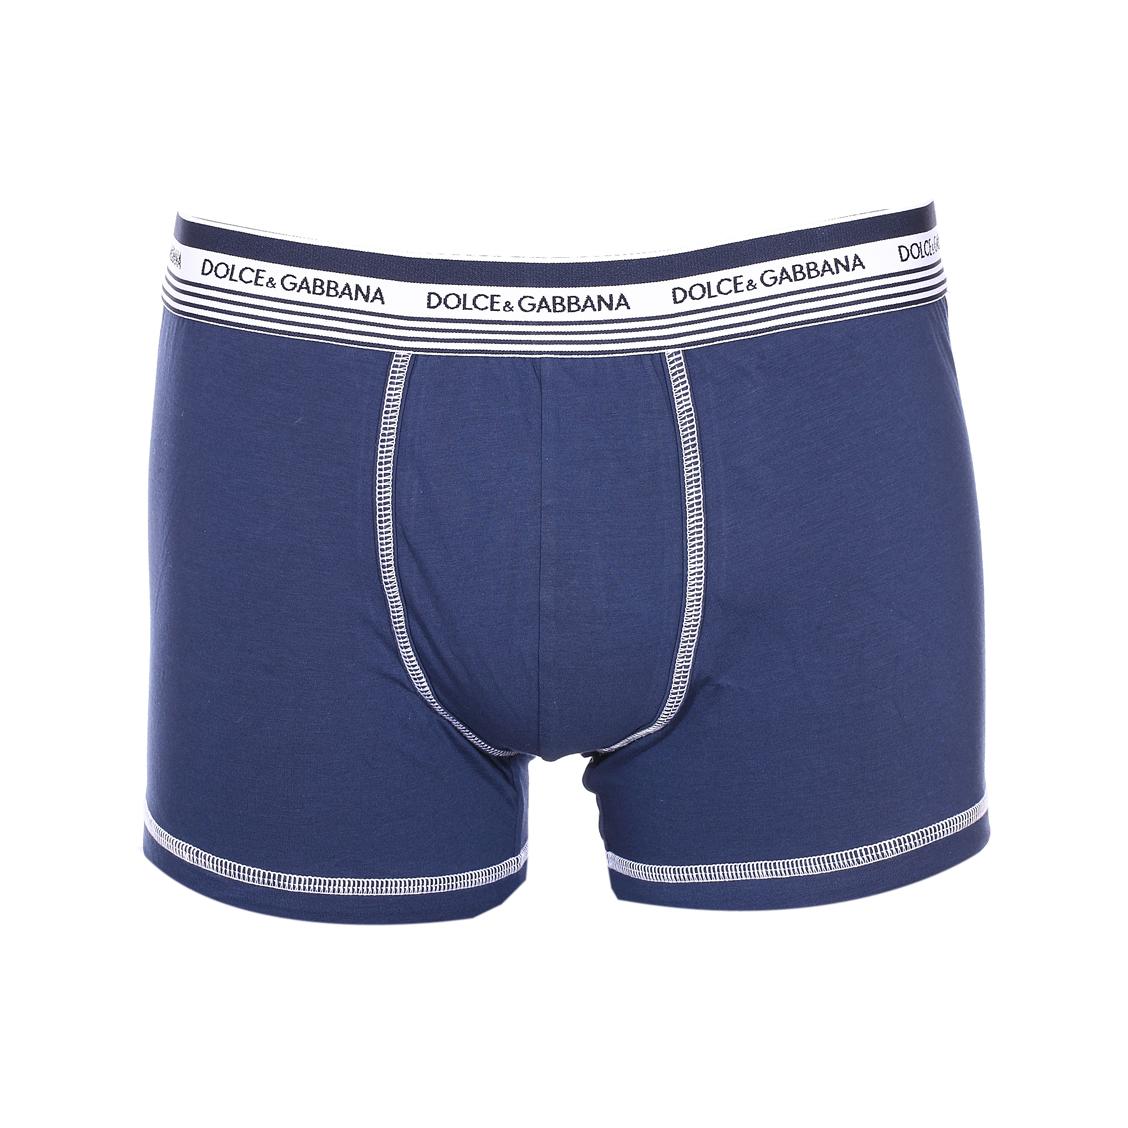 Boxer  en coton stretch bleu marine, ceinture blanche à rayures bleu marine